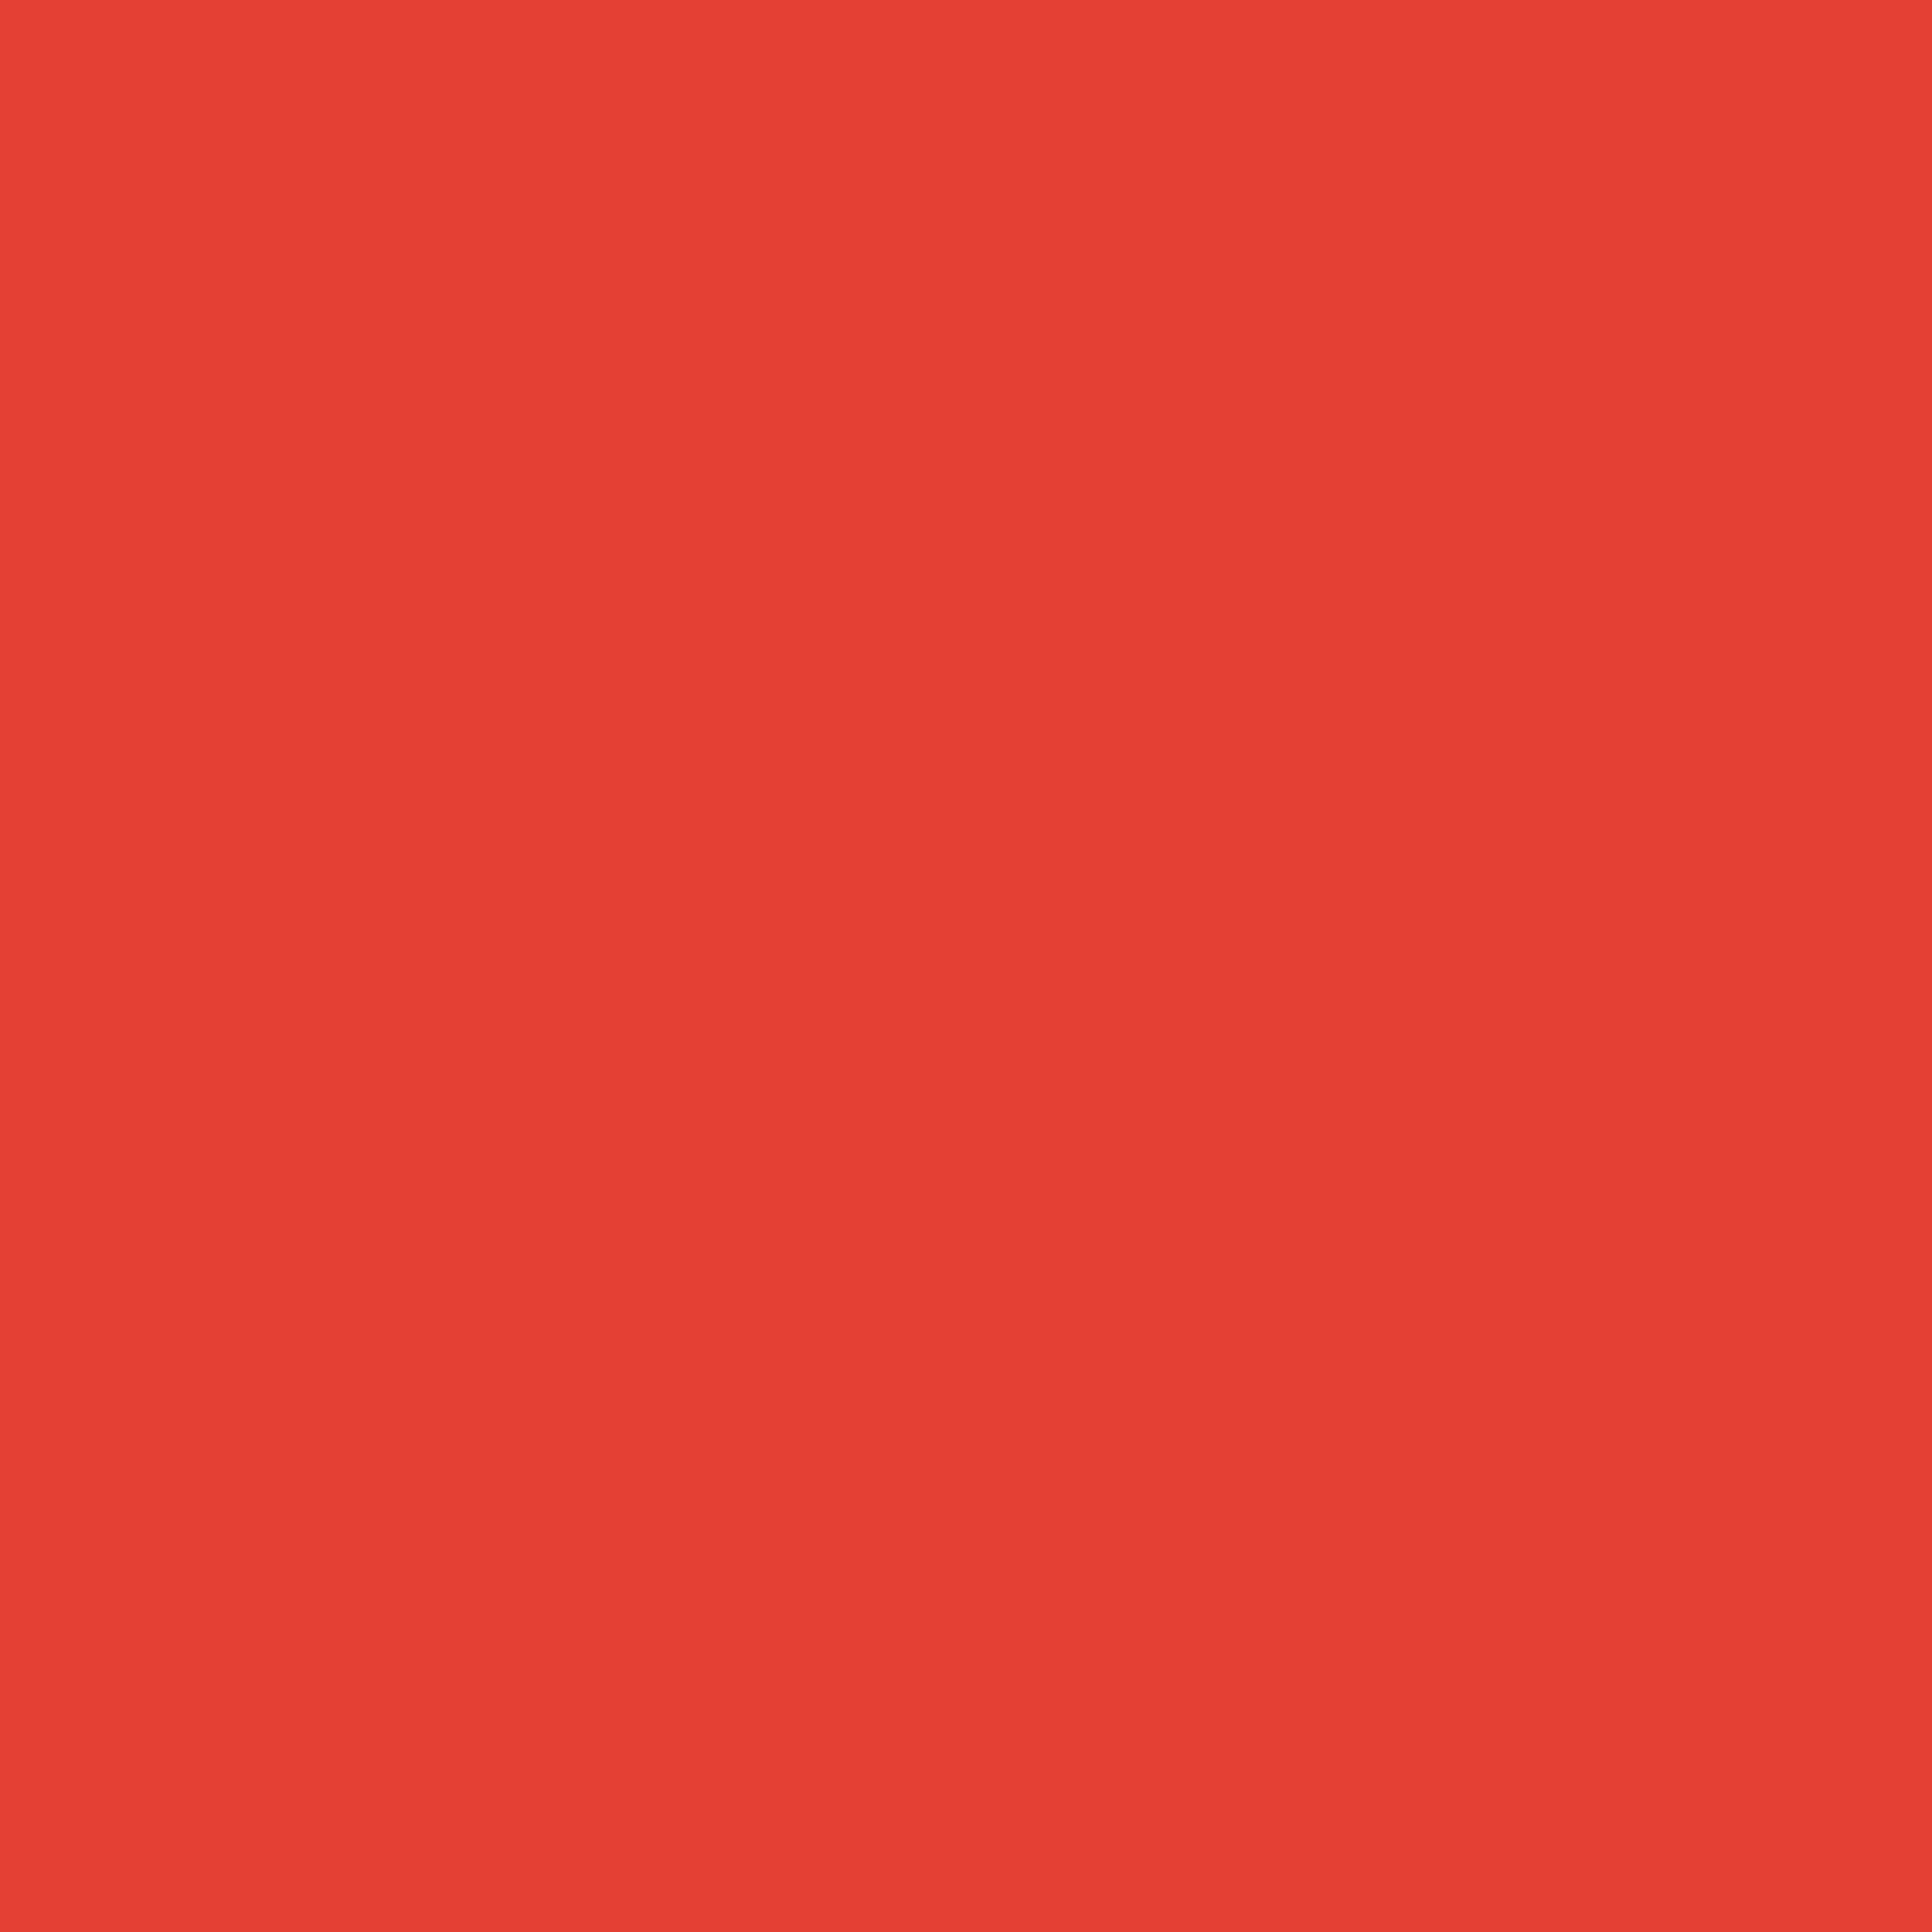 2732x2732 Vermilion Cinnabar Solid Color Background